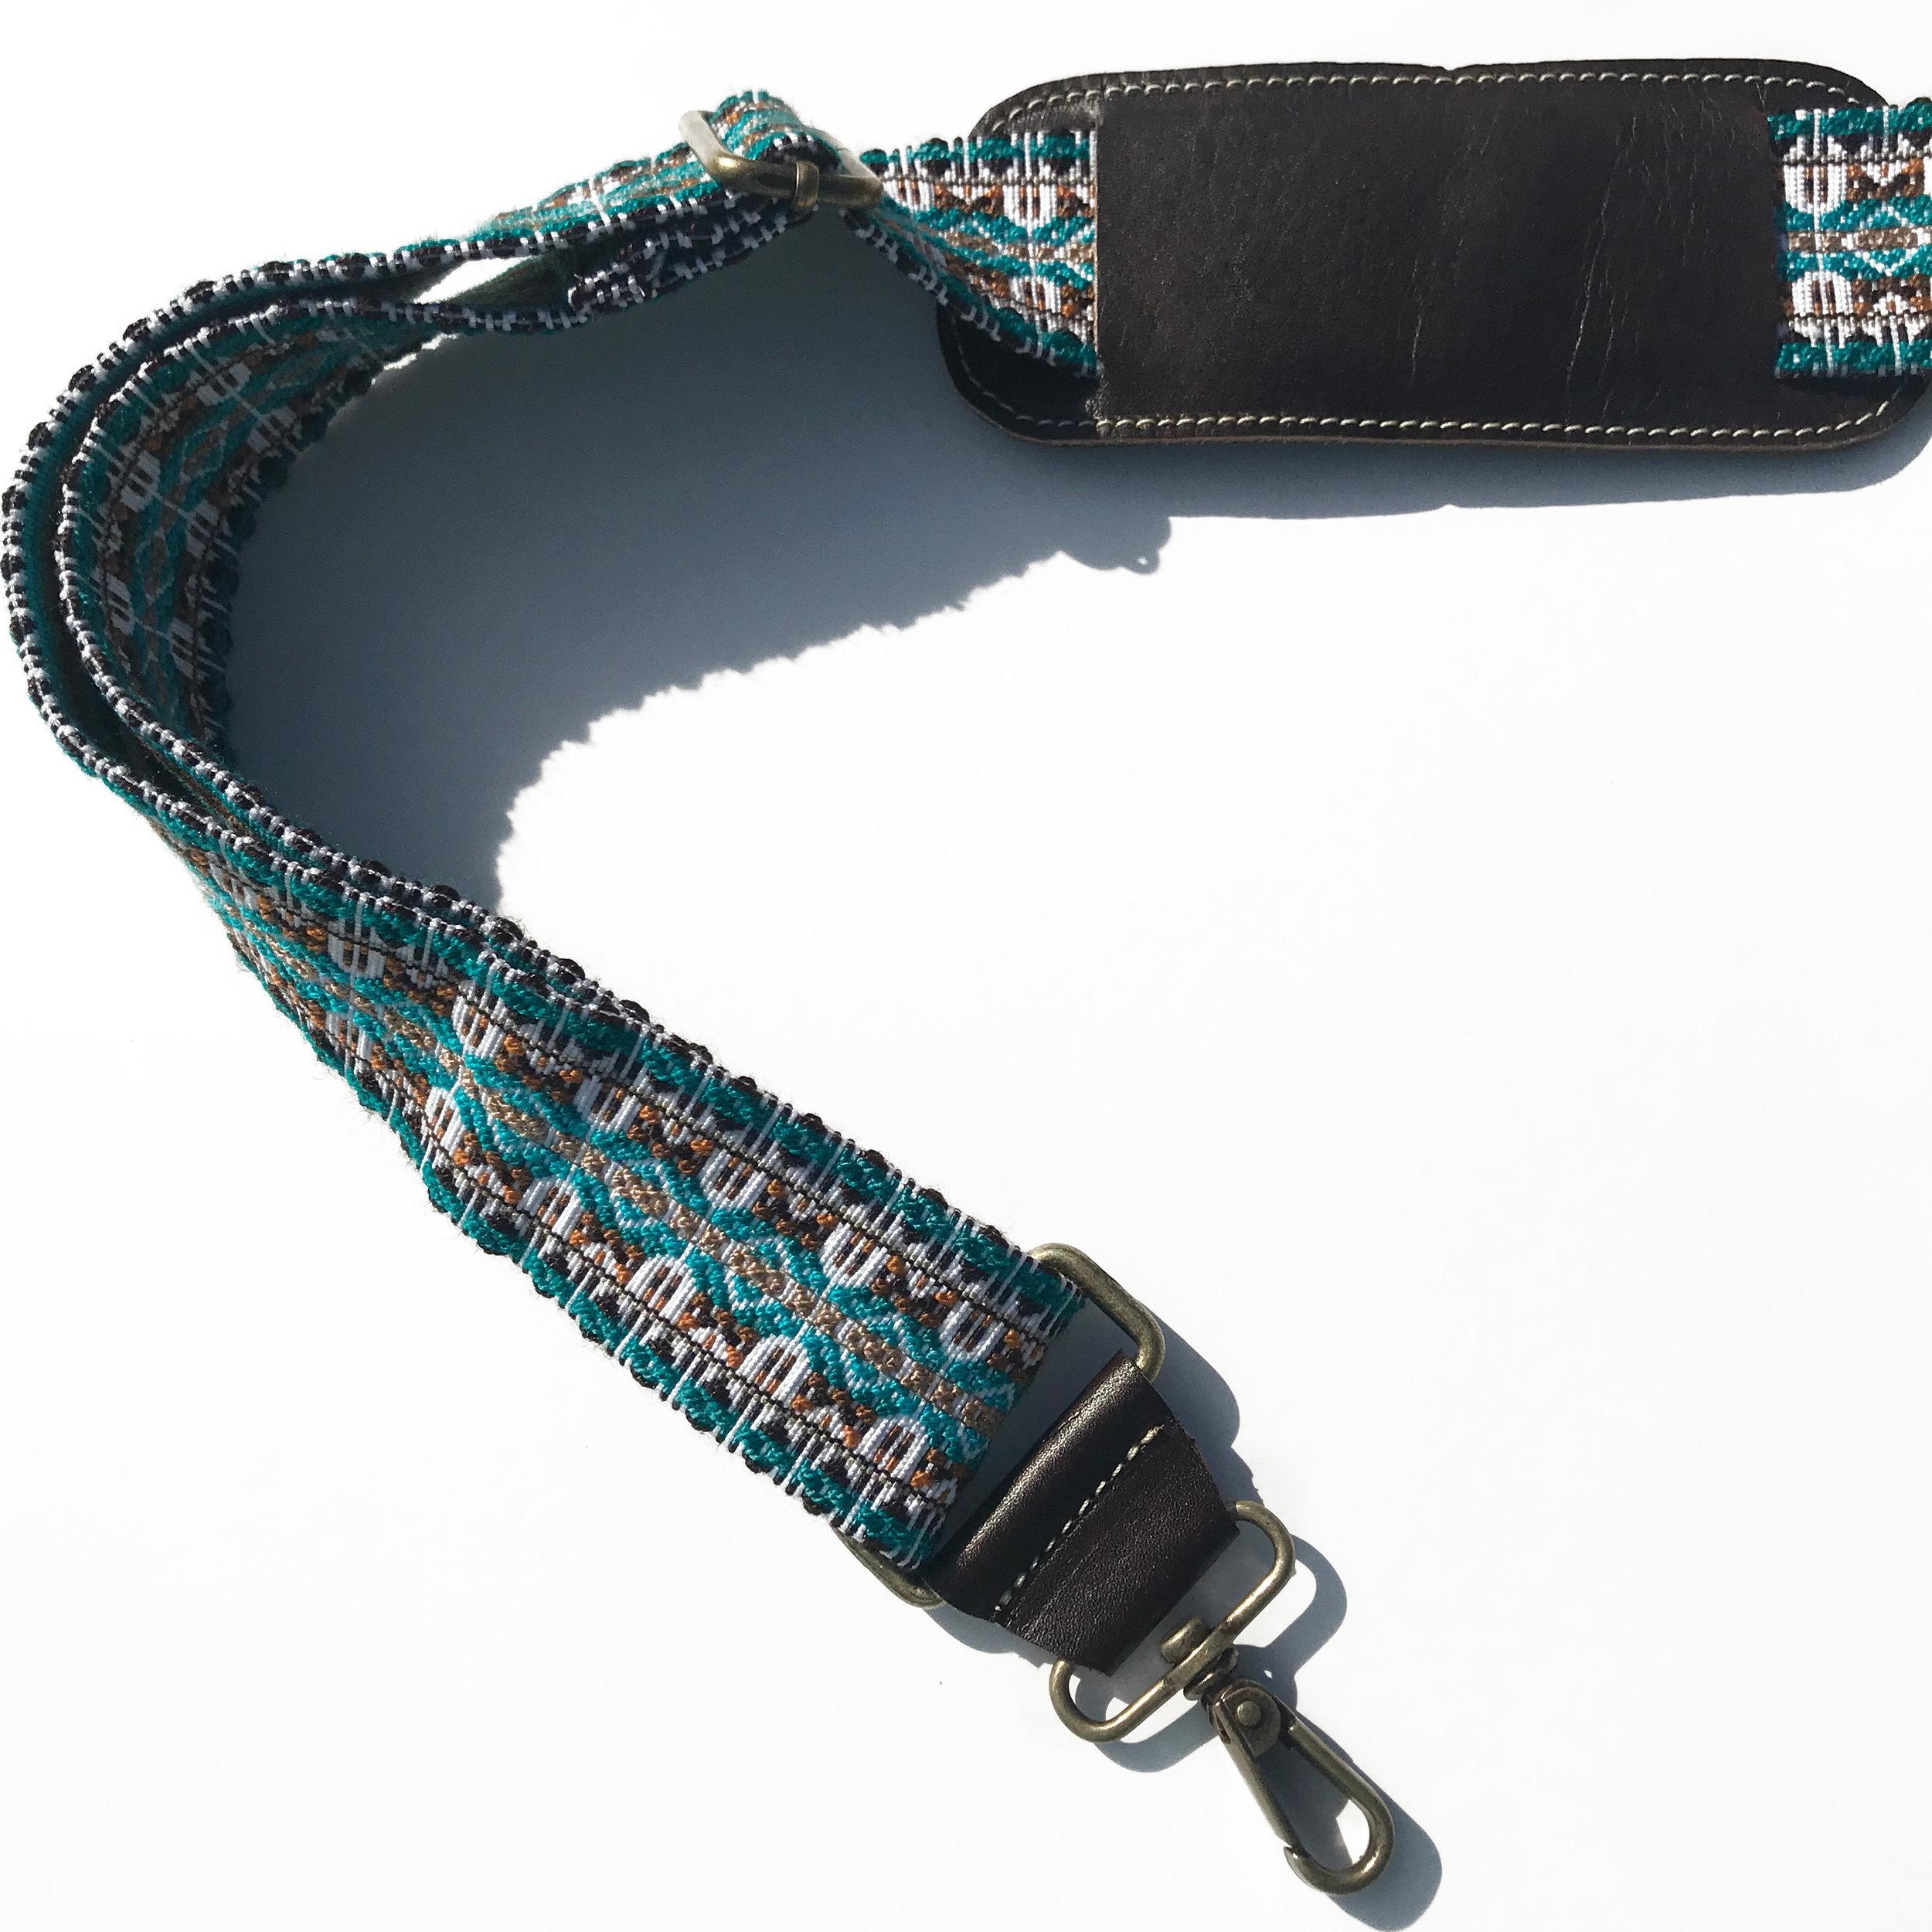 2019 loom-woven handbag strap by VerverWerks.